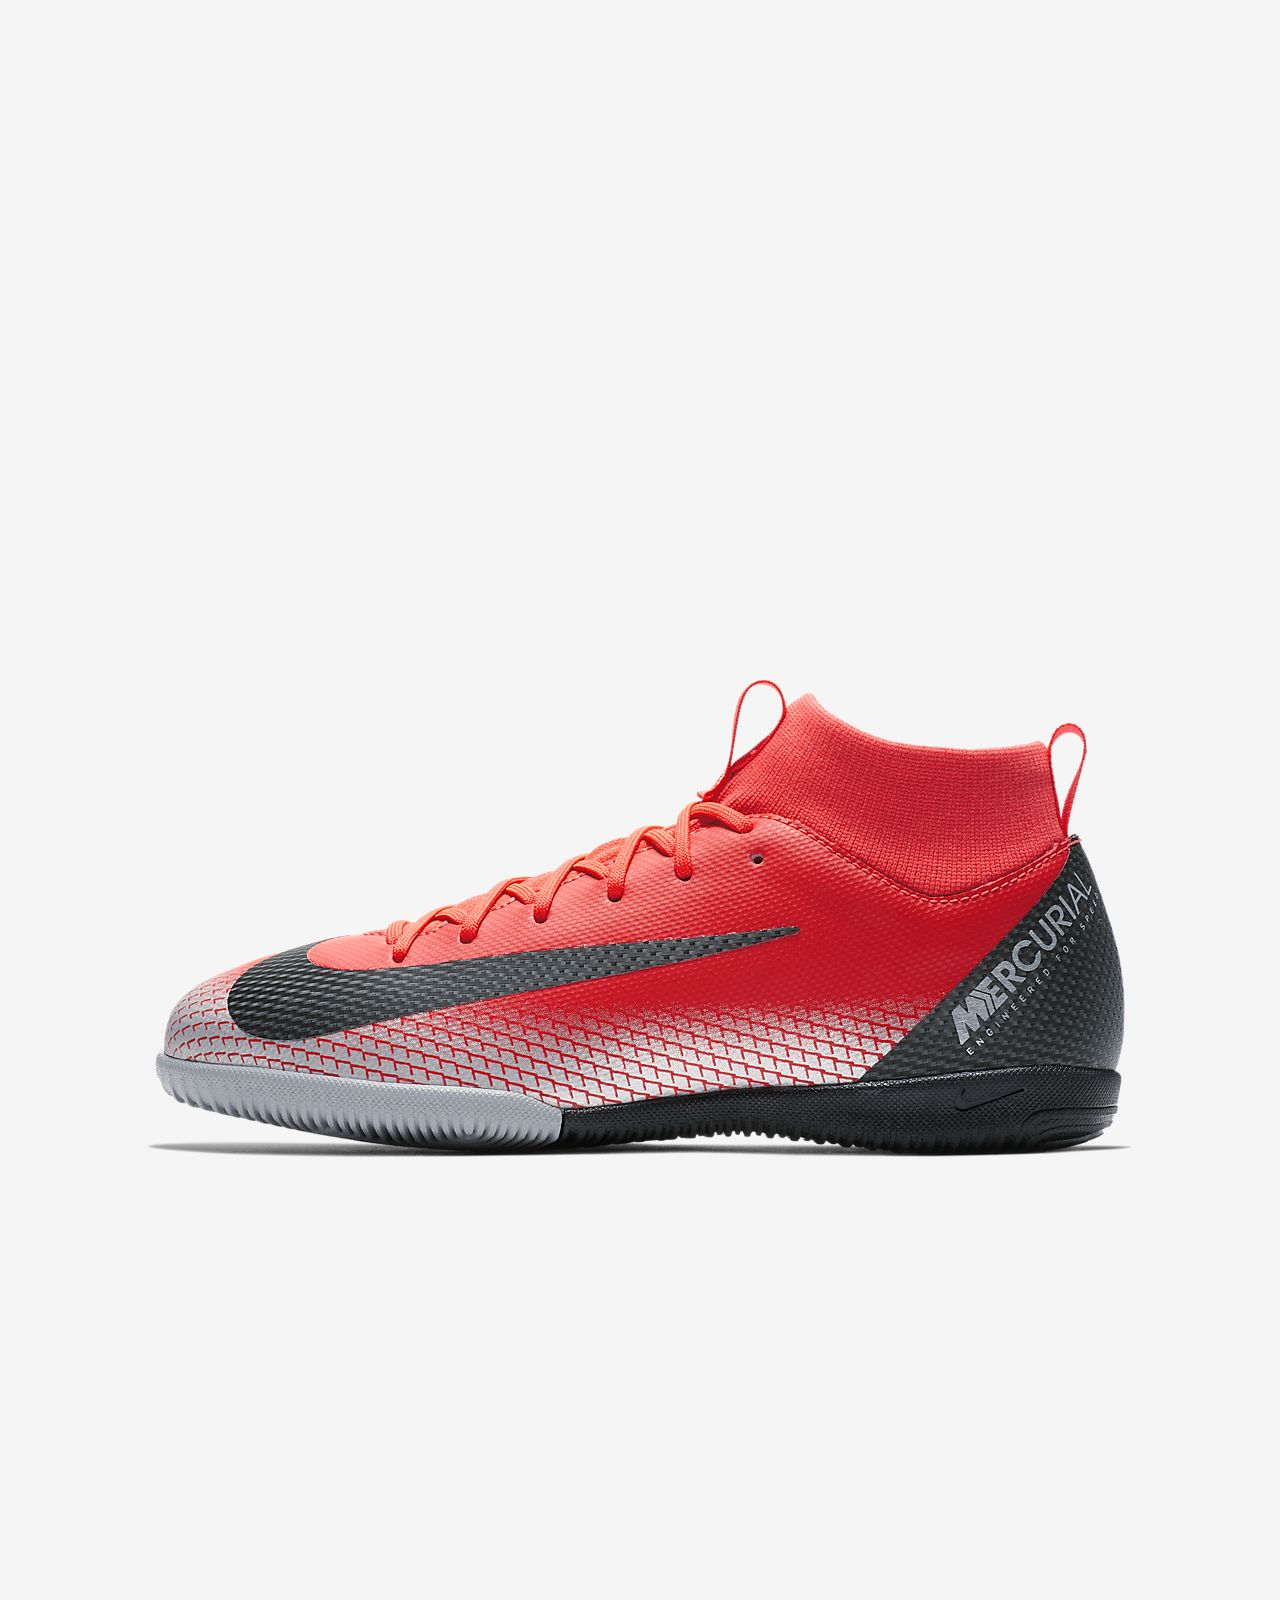 CR7 Jr. SuperflyX 6 Academy IC Botas de fútbol sala - Niño a. Nike ... 10434136374b1